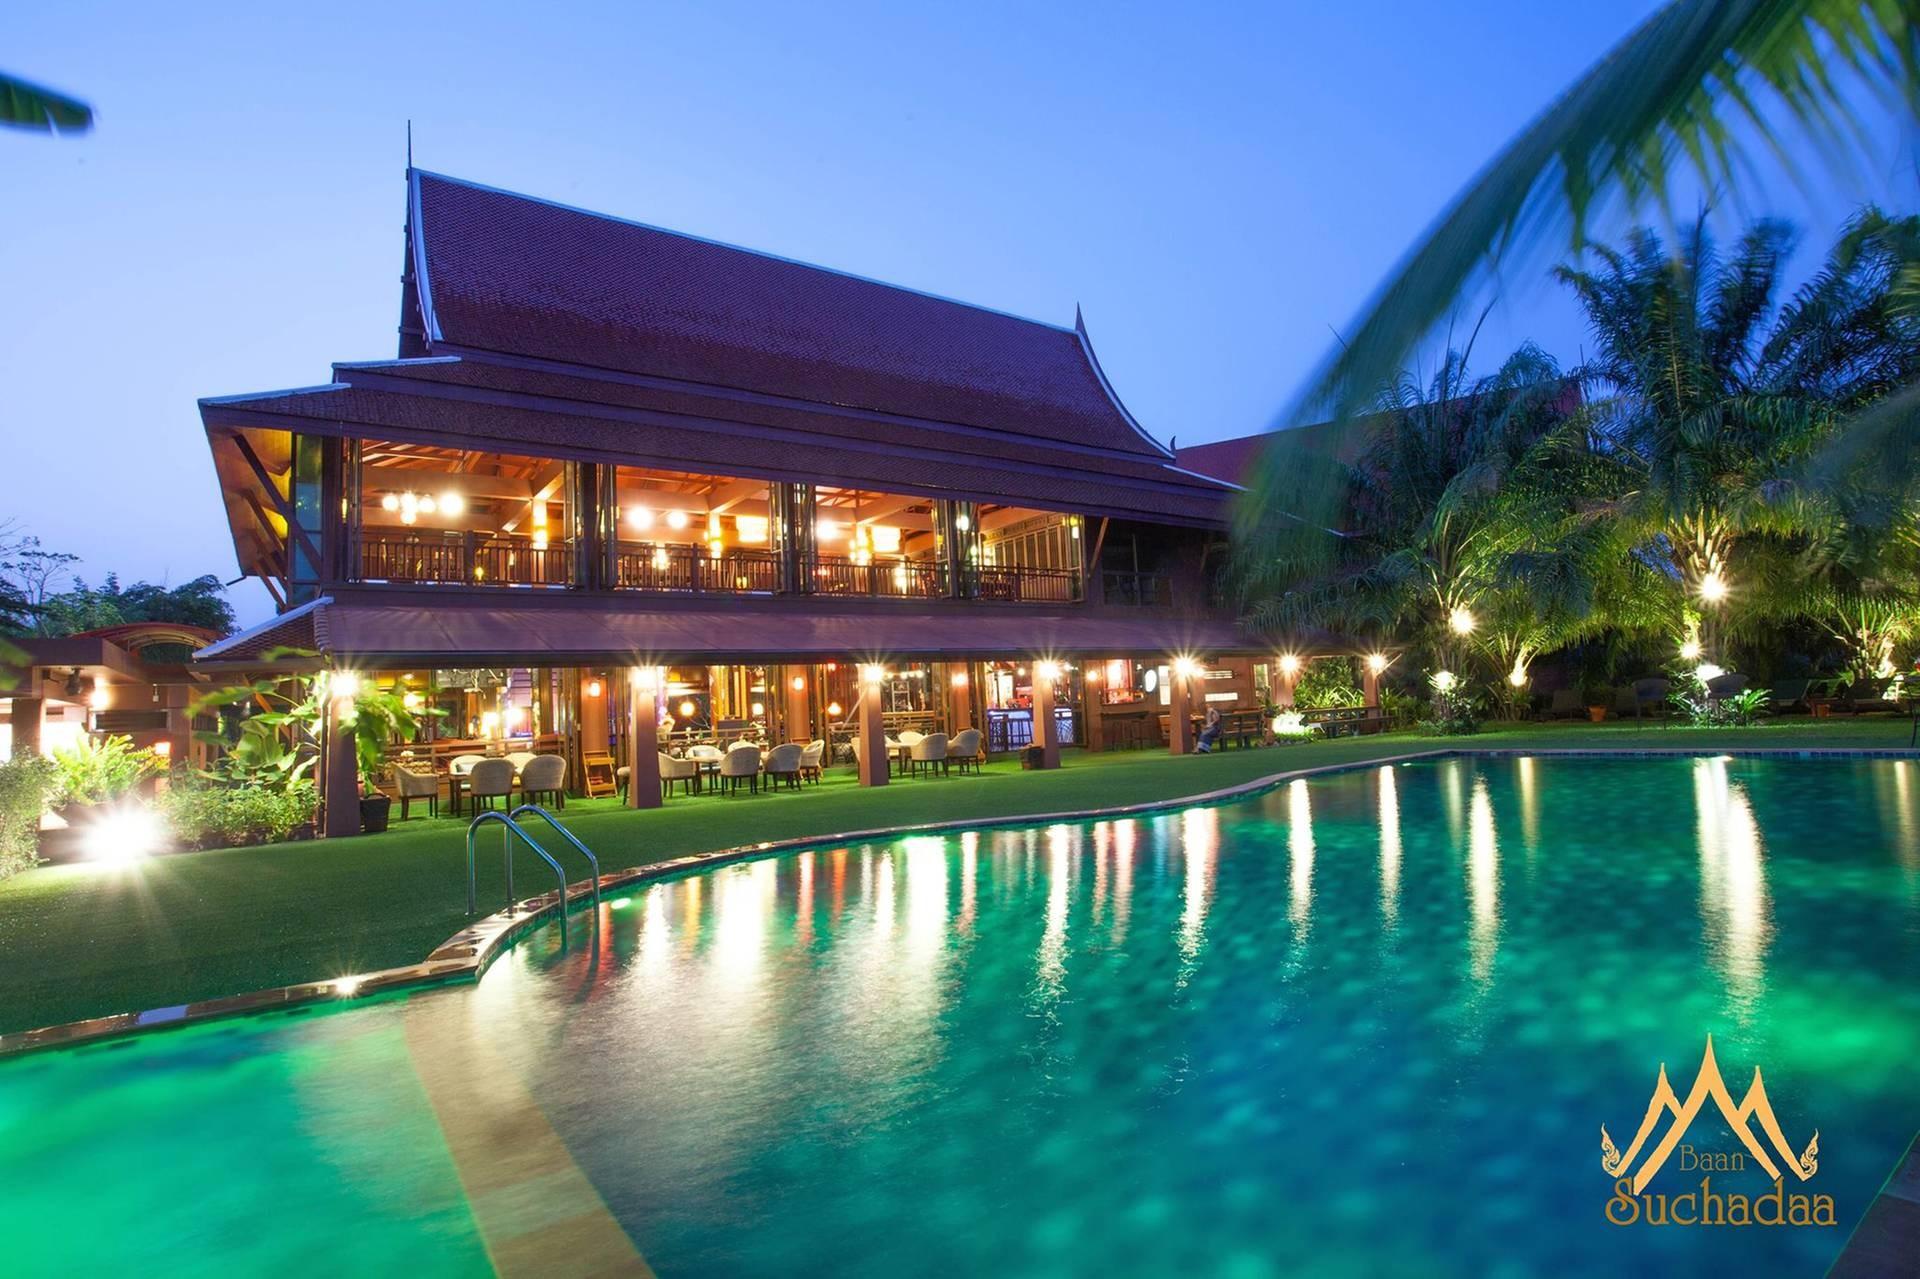 Thanks : Baan Suchadaa Lampang Resort